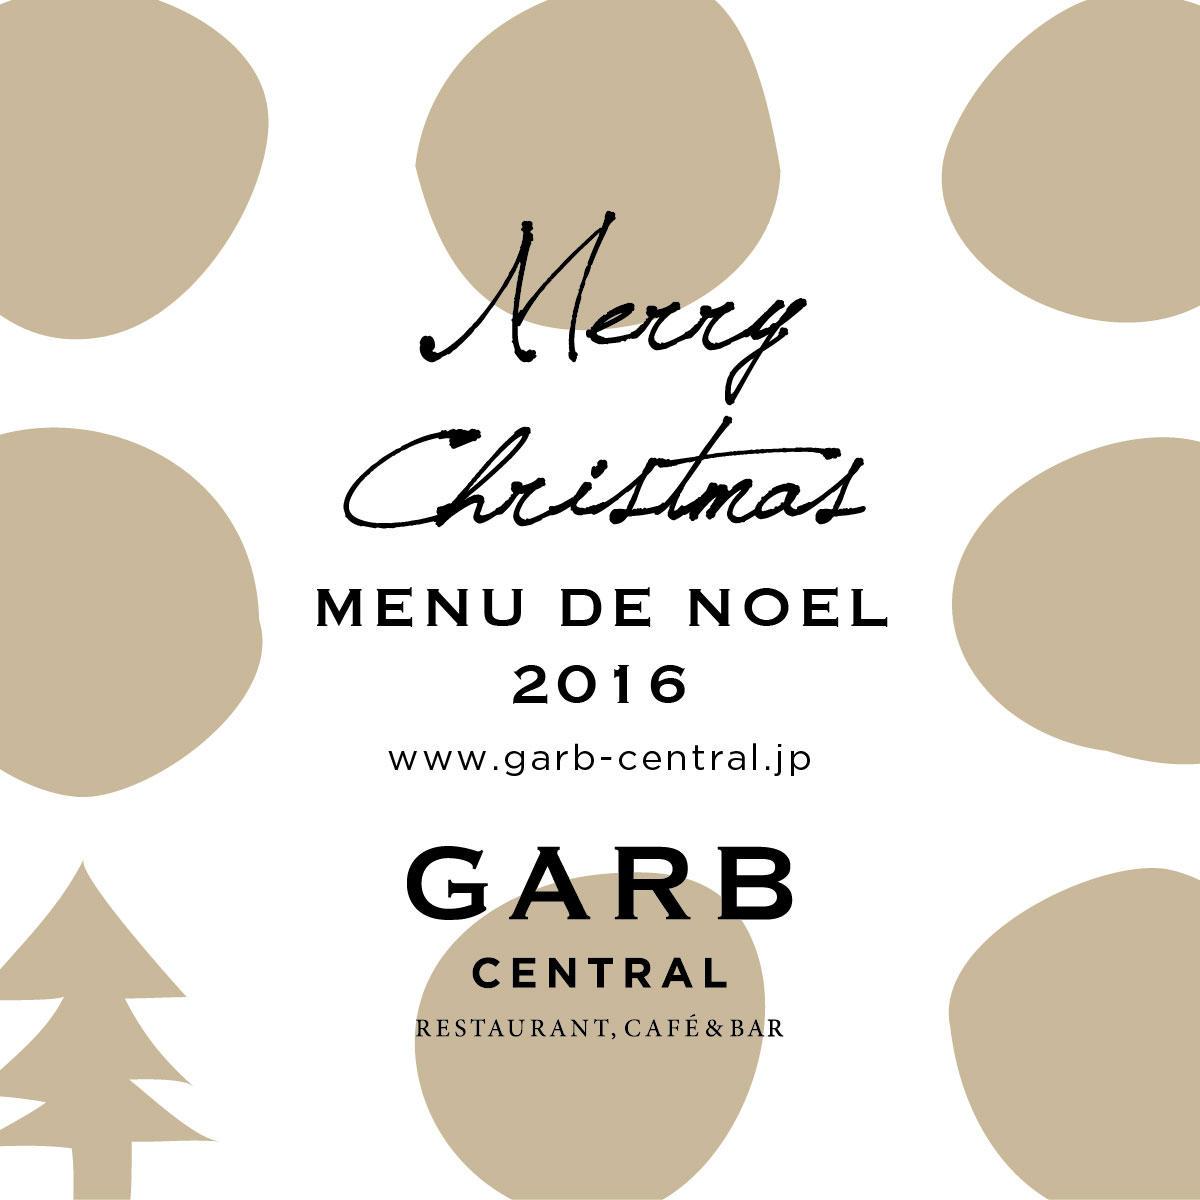 GARB CENTRAL XMAS 2016